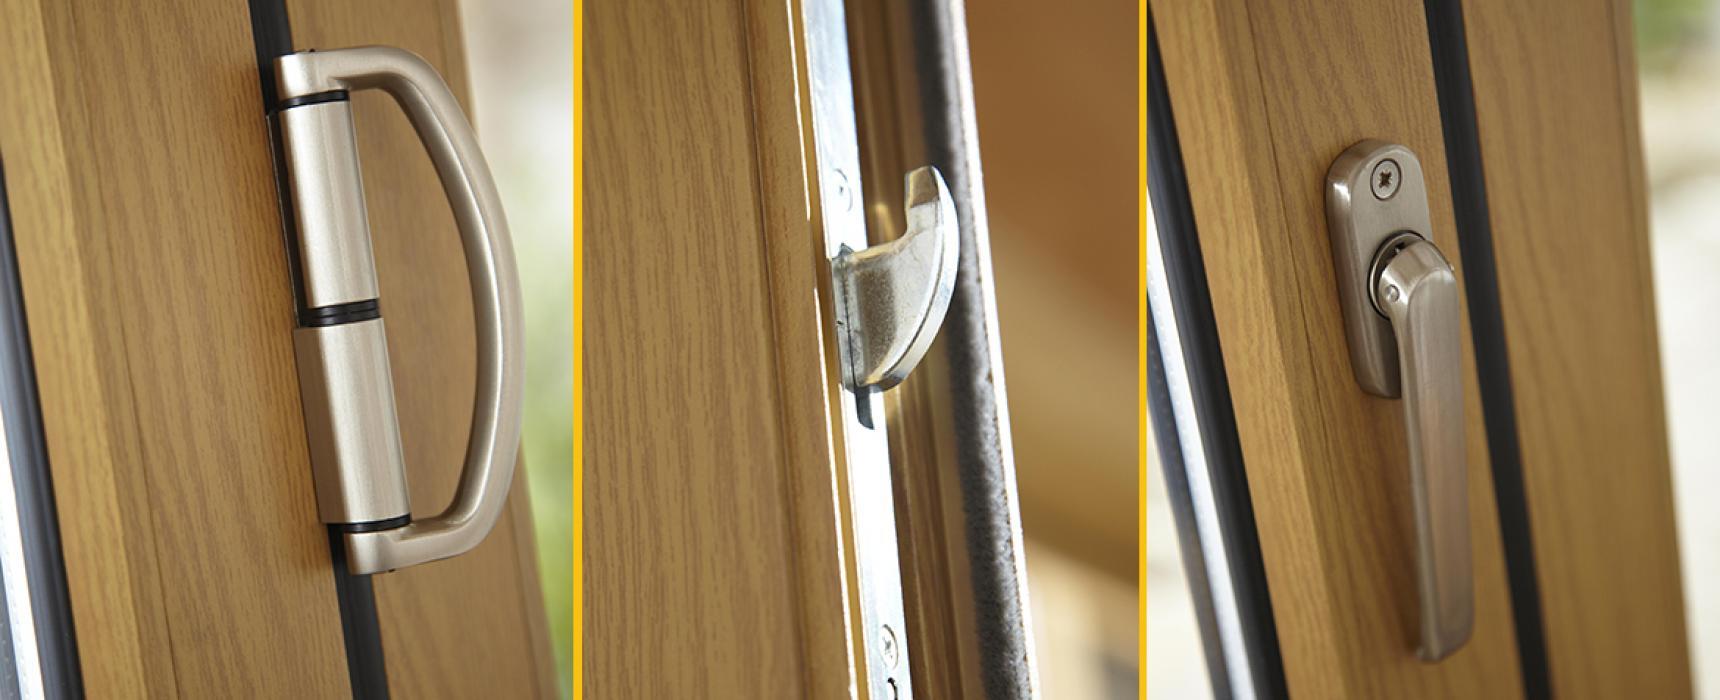 Origin hardware, handle, on a wood grain effect aluminium bi-folding door